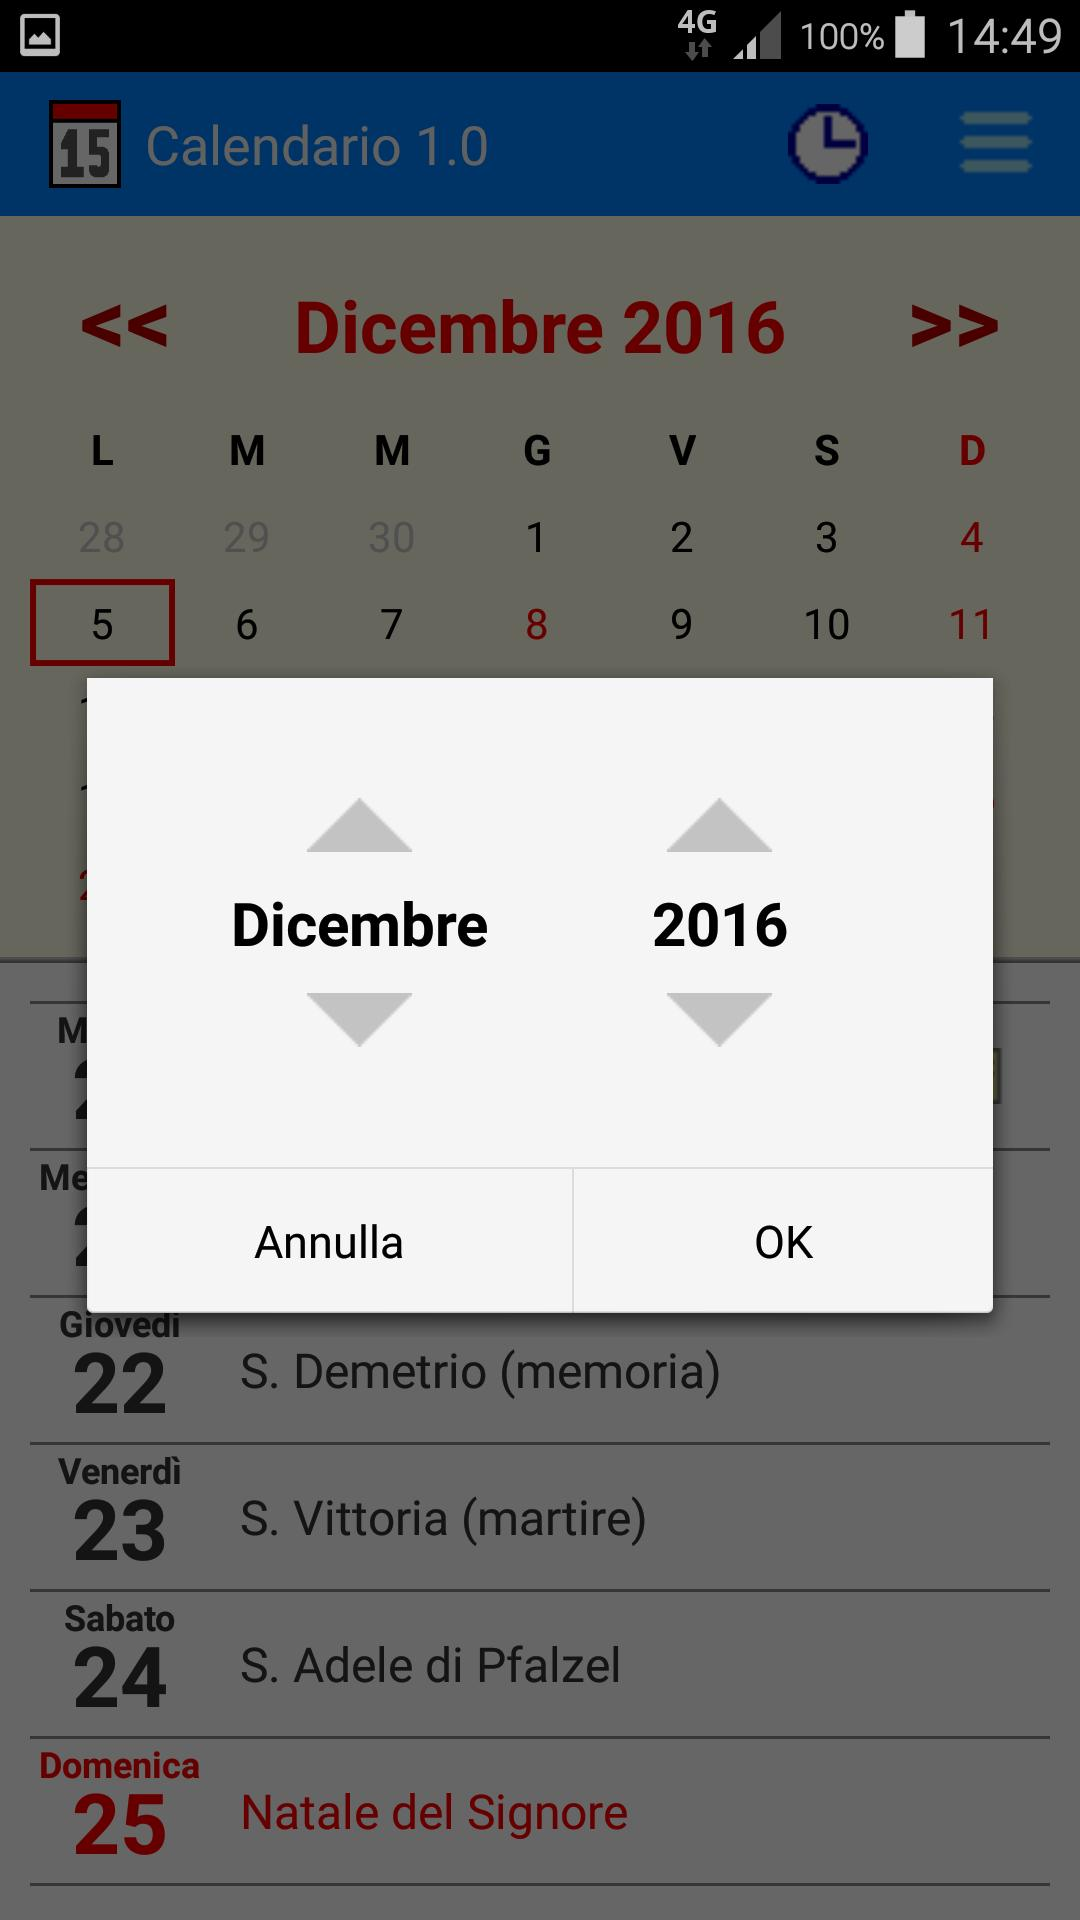 Onomastici Calendario.Calendario For Android Apk Download